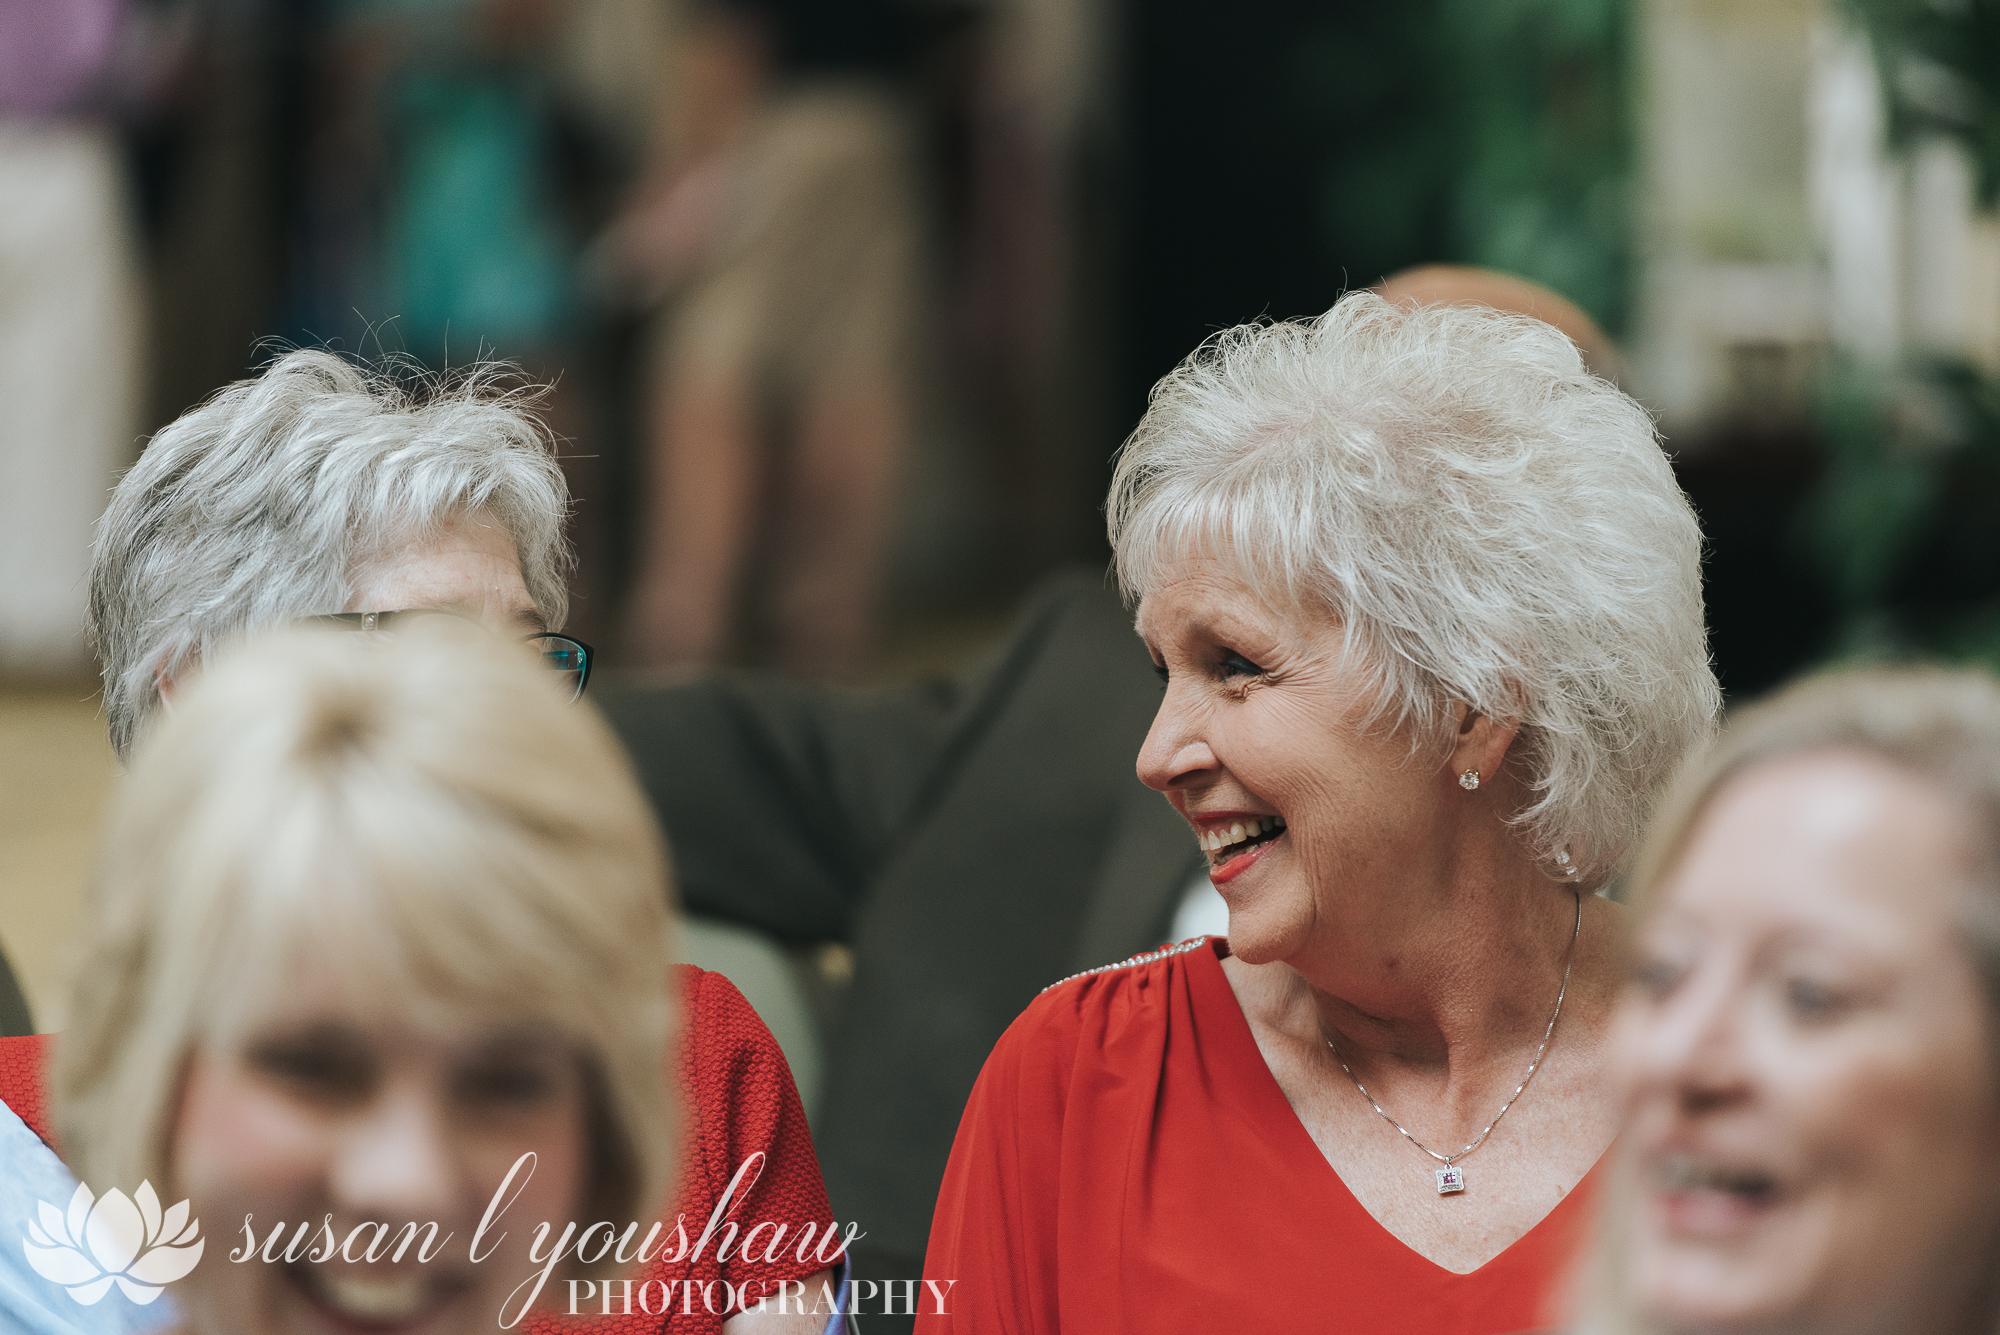 BLOG Carolyn Adams and Jim McCune 07-04-2018 SLY Photography-55.jpg